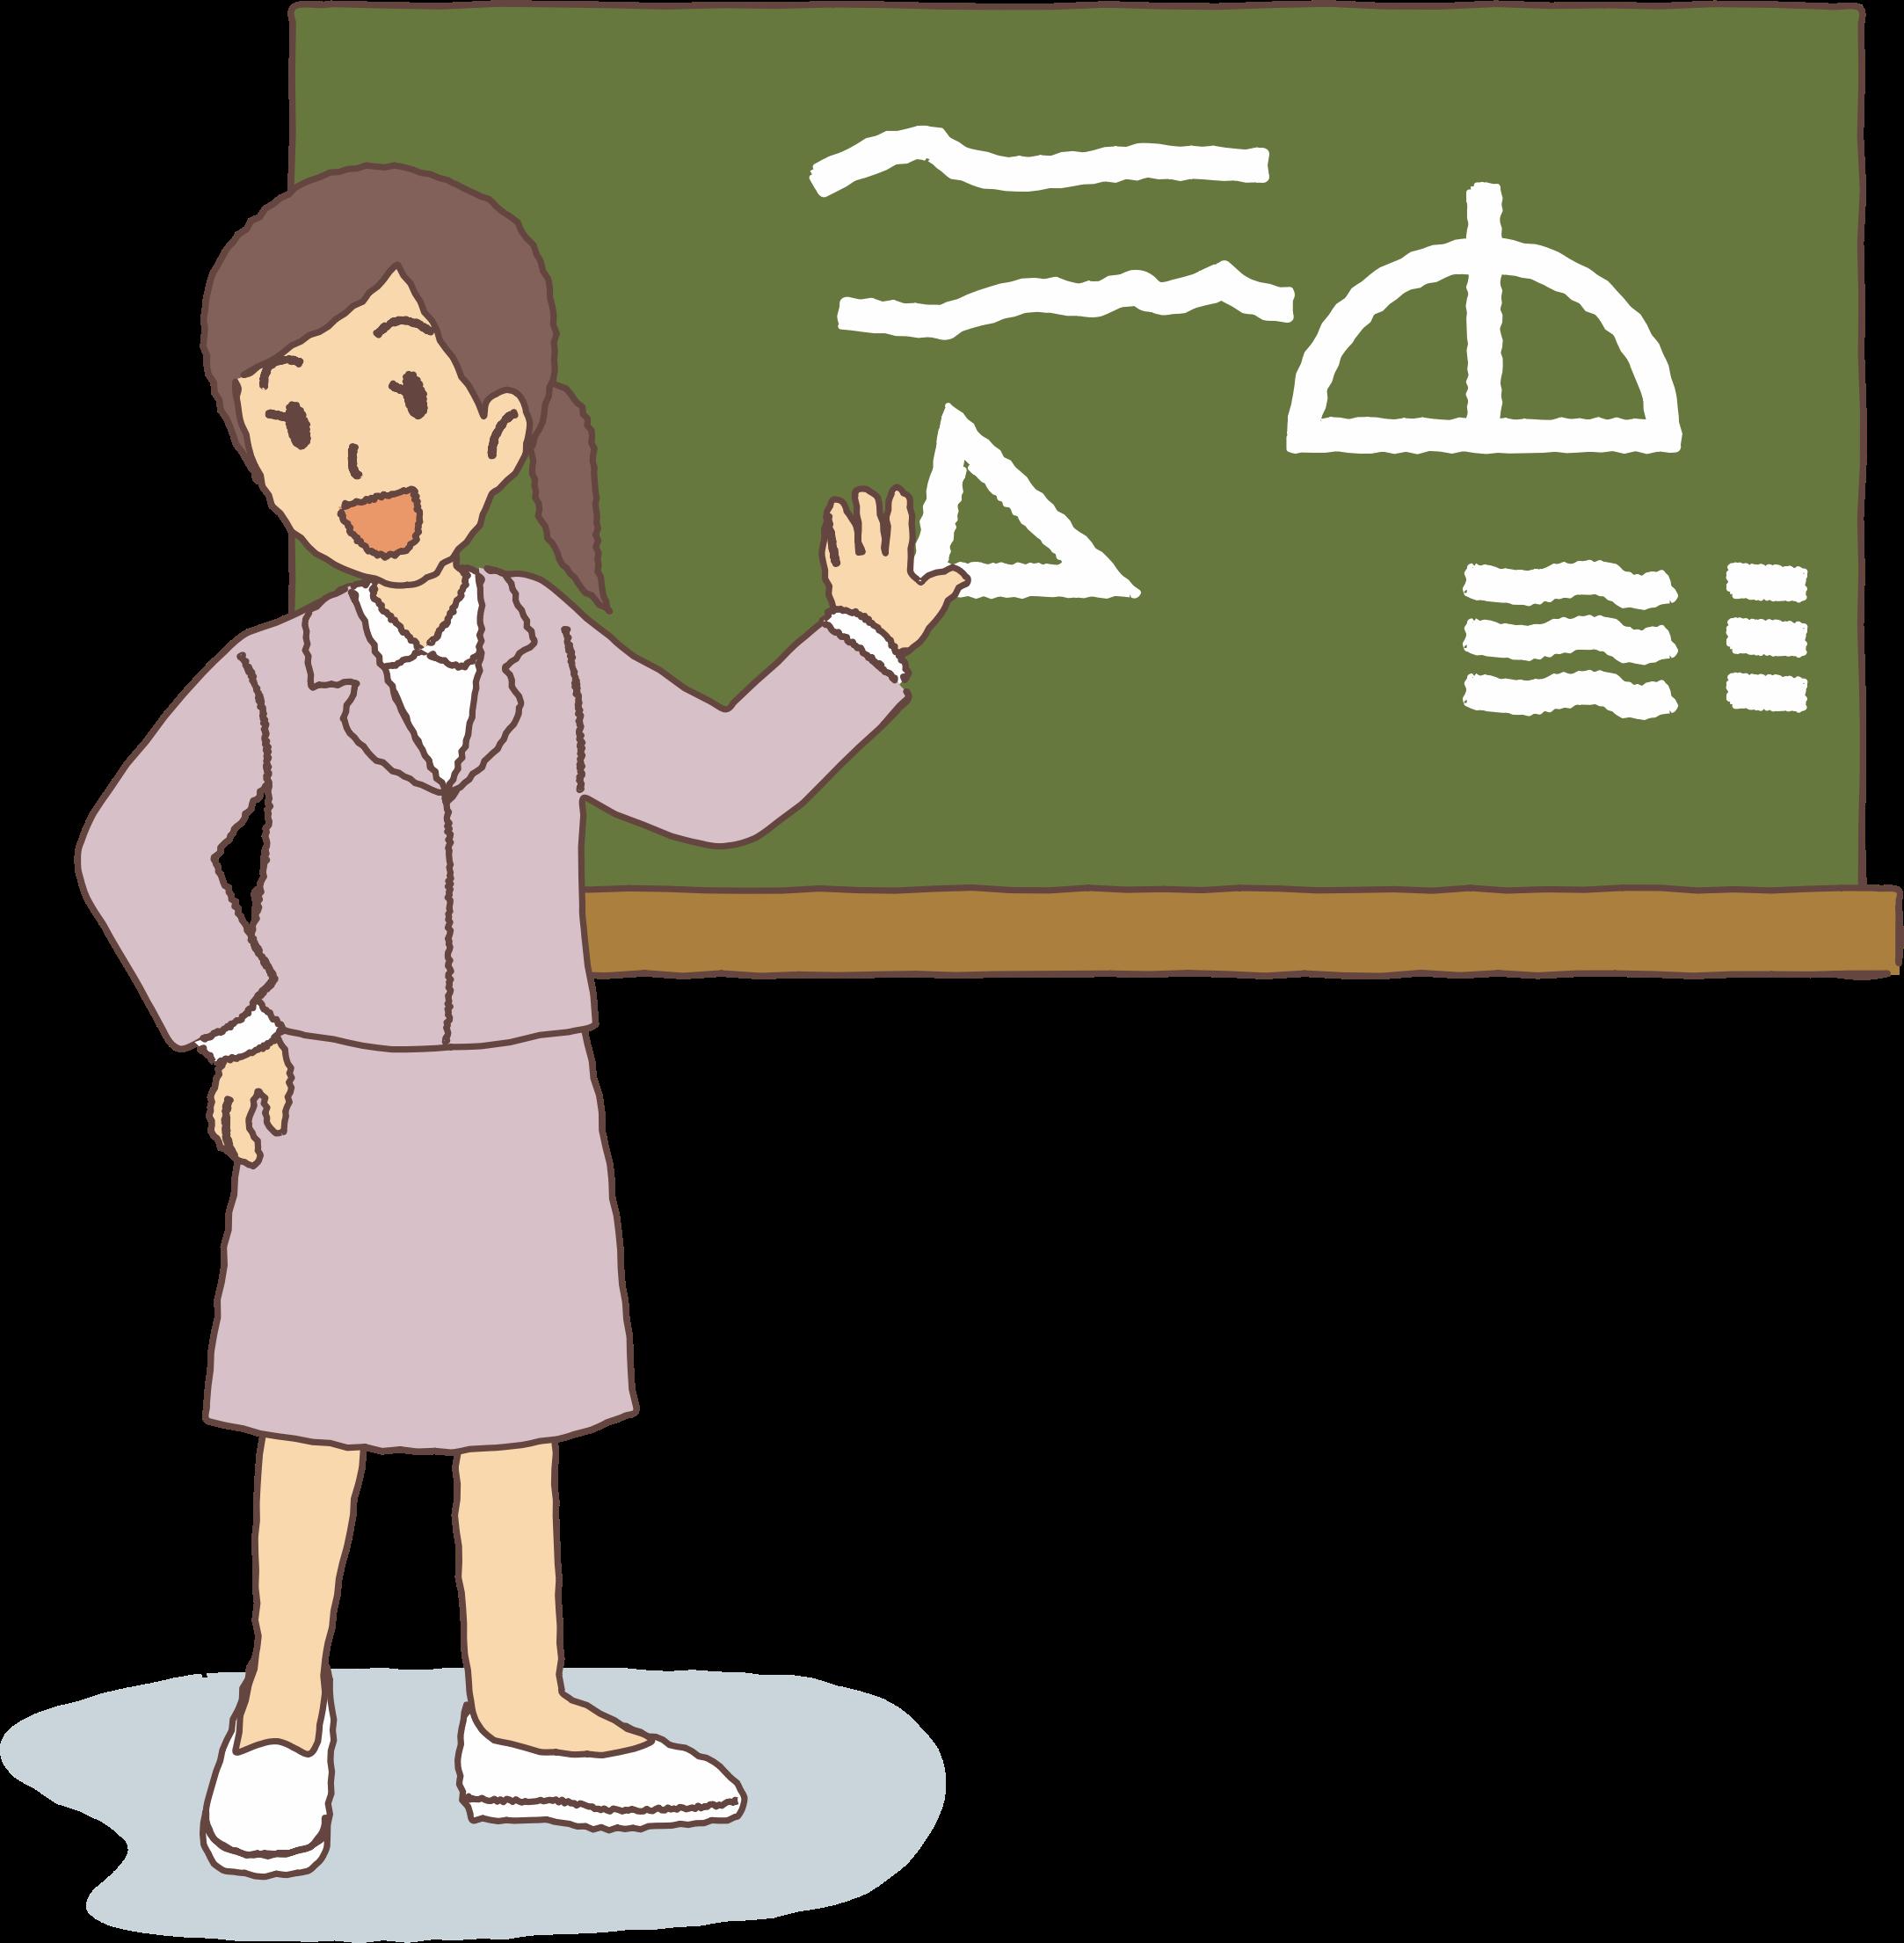 Female big image png. Number 1 clipart teacher